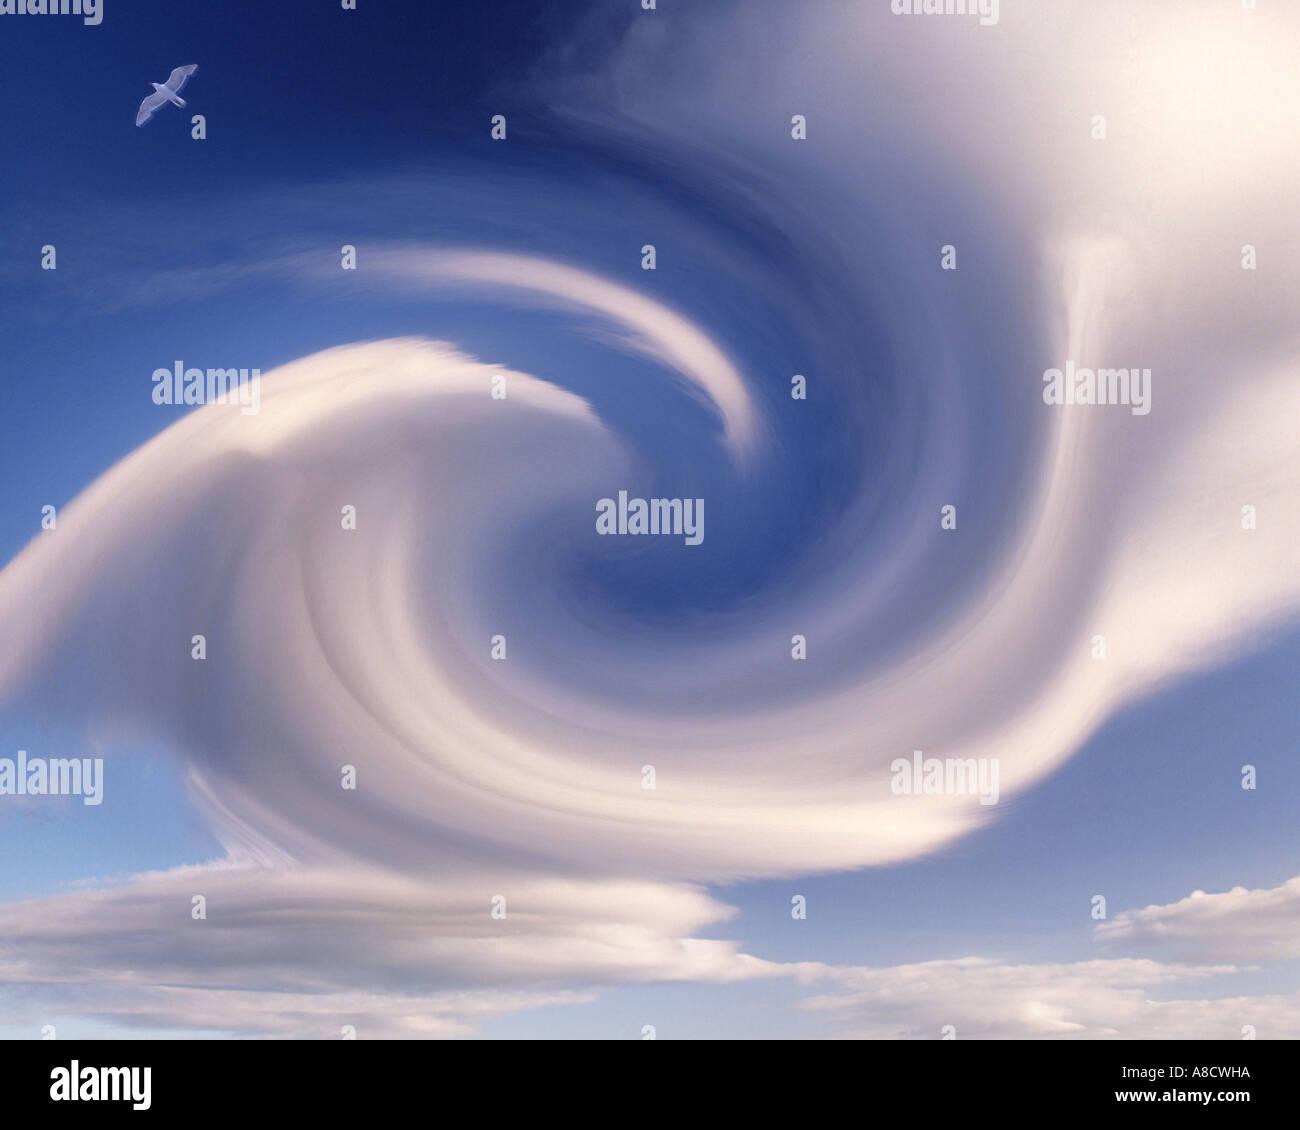 BACKGROUND CONCEPT:  Digital Cloud Formation - Stock Image